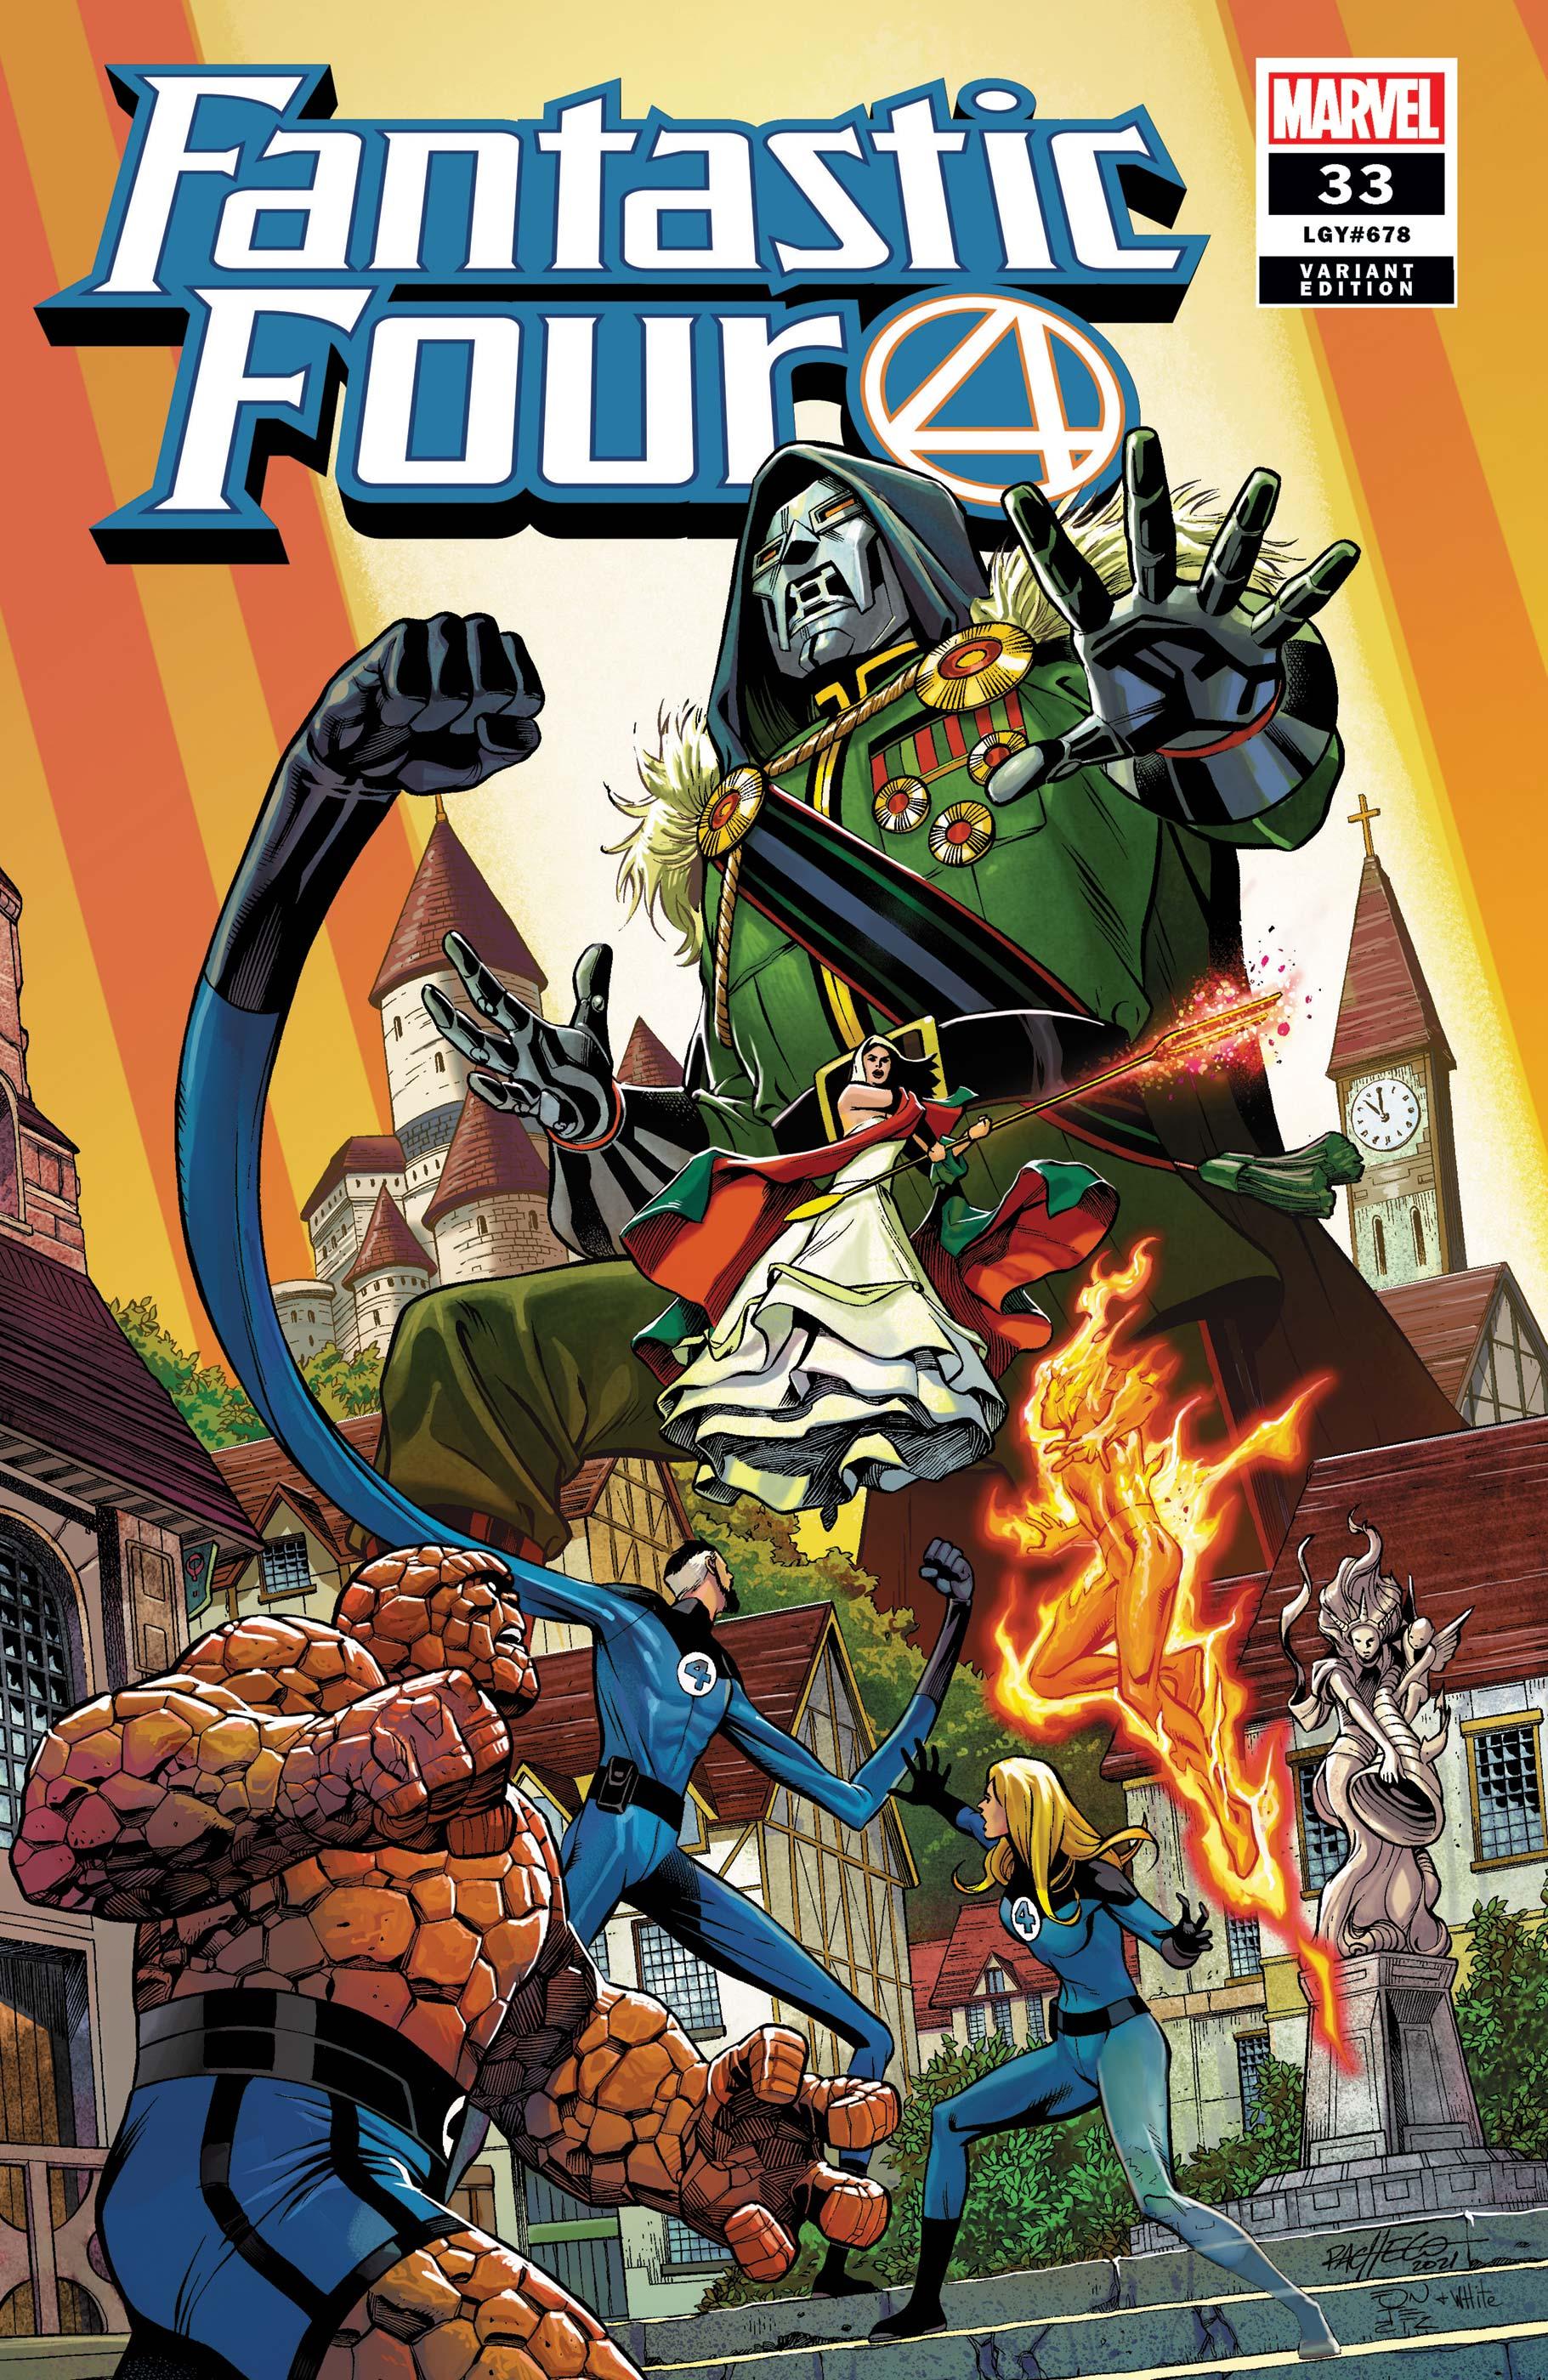 Fantastic Four (2018) #33 (Variant)